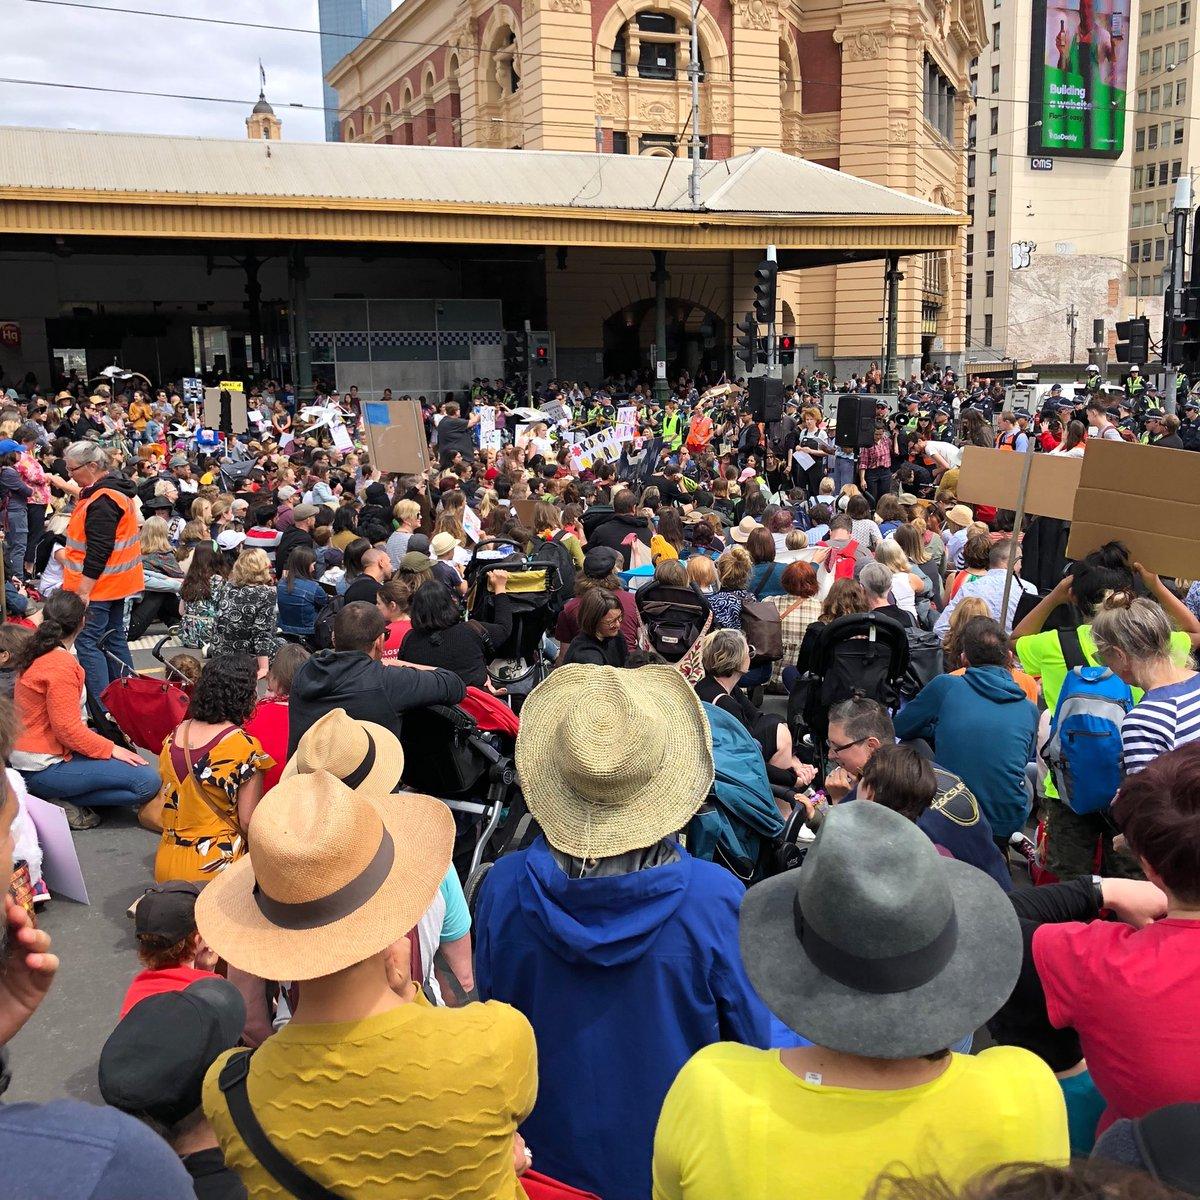 Swanston St shut down as people sit down to demand #KidsOffNauru